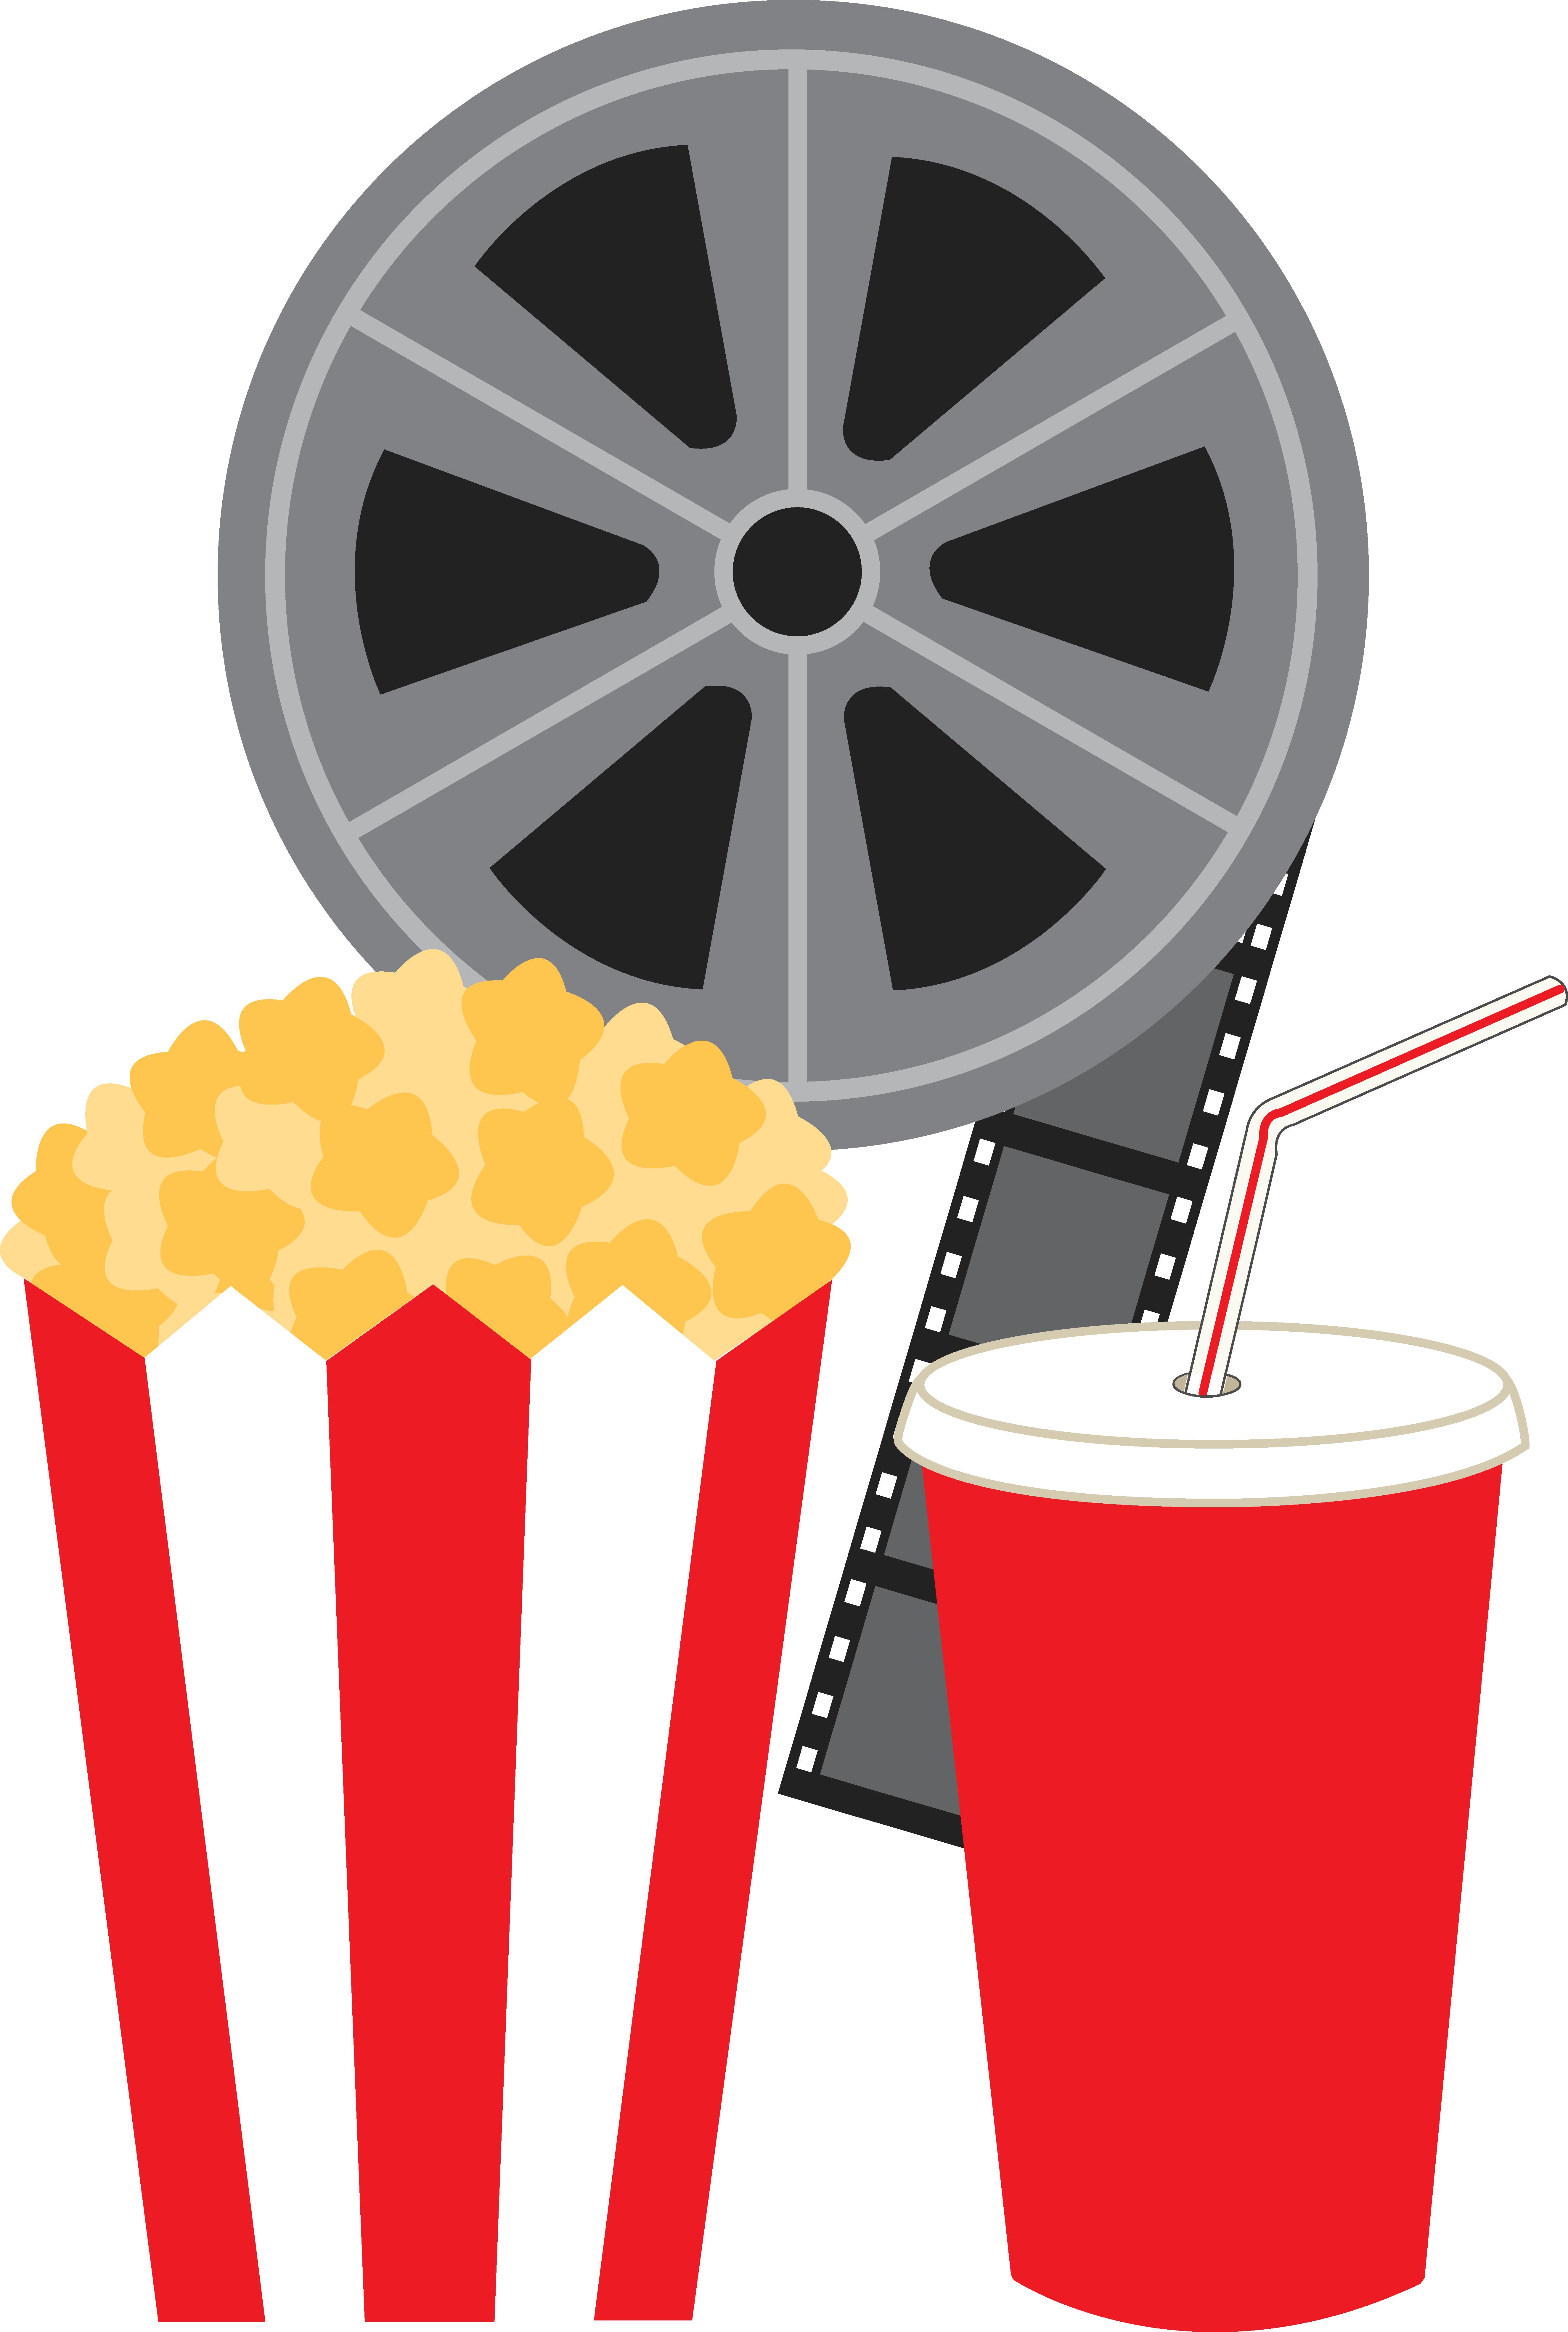 5296x7877 Free Clip Art Stickers Clip Art, Movie Popcorn